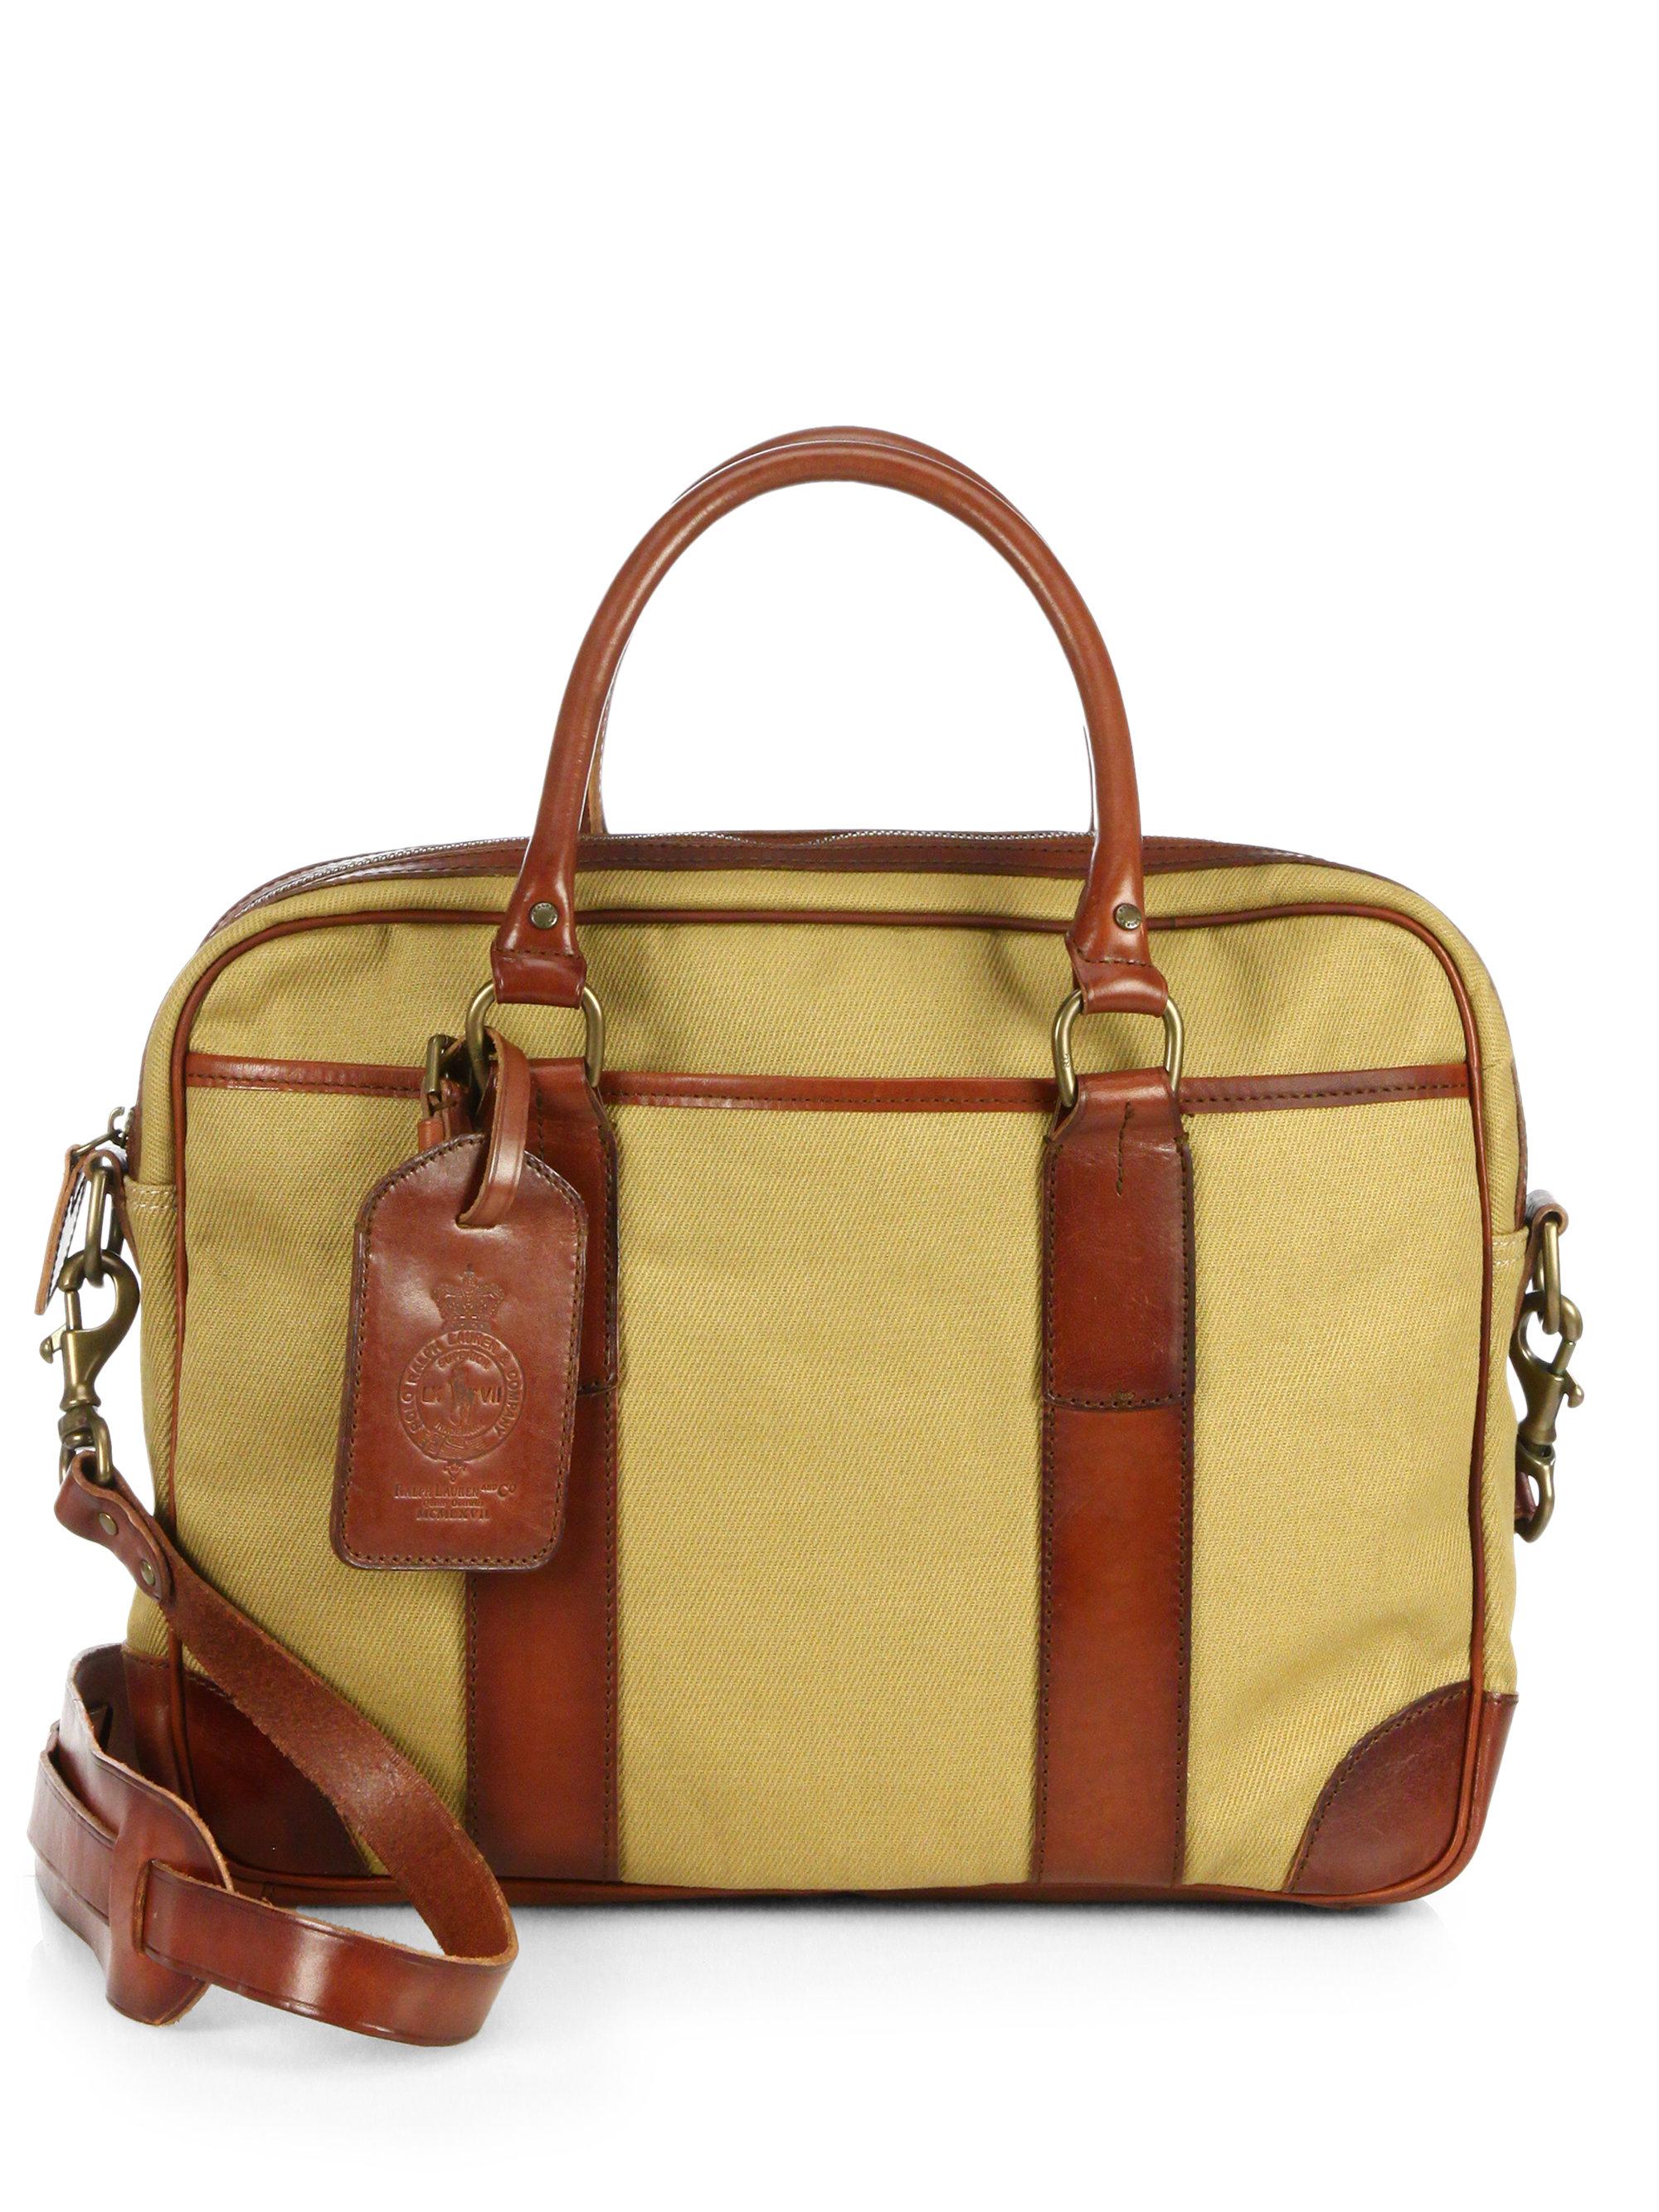 f17e9896f8 Lyst - Polo Ralph Lauren Soft Waxed Twill Canvas Briefcase in ...